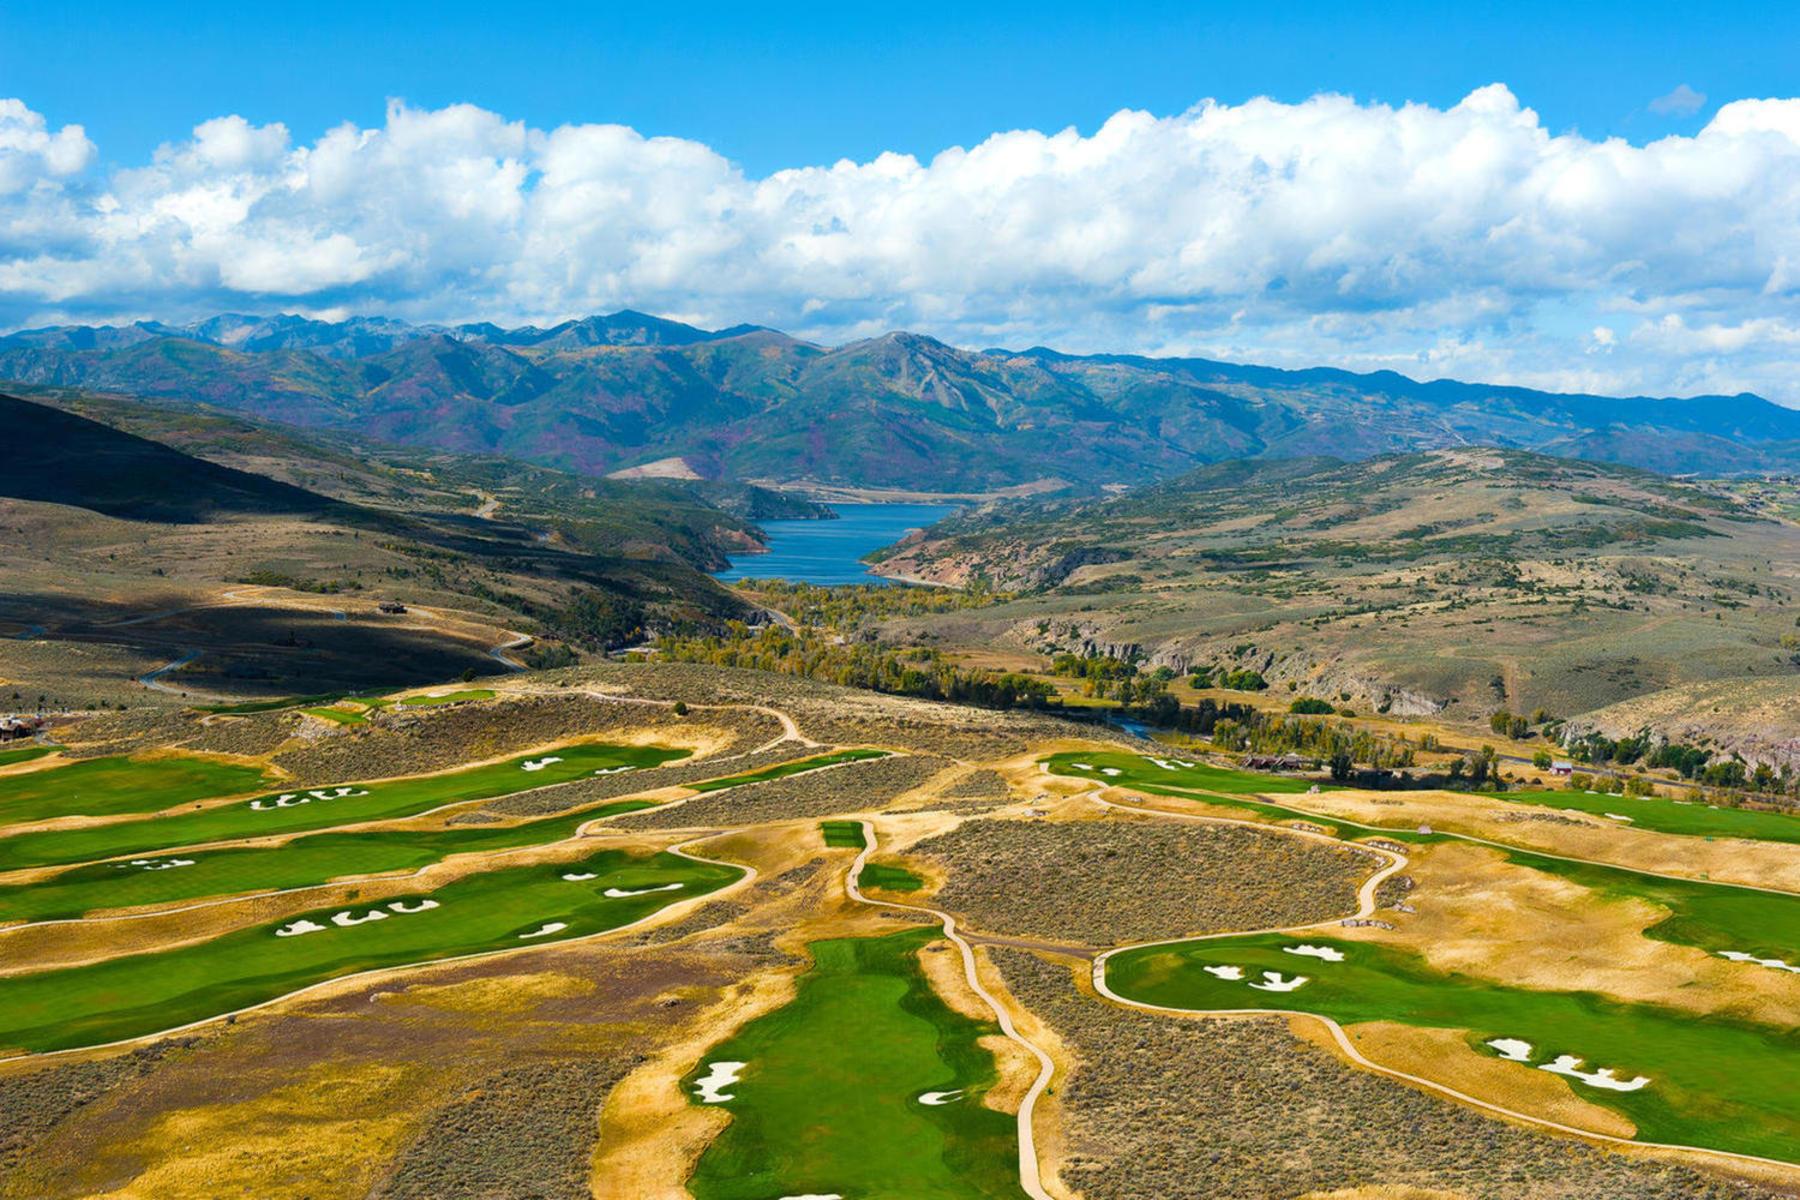 Terreno para Venda às Gorgeous Panoramic Views at Victory Ranch 7236 N Starlight Cir Lot #211, Heber City, Utah, 84032 Estados Unidos